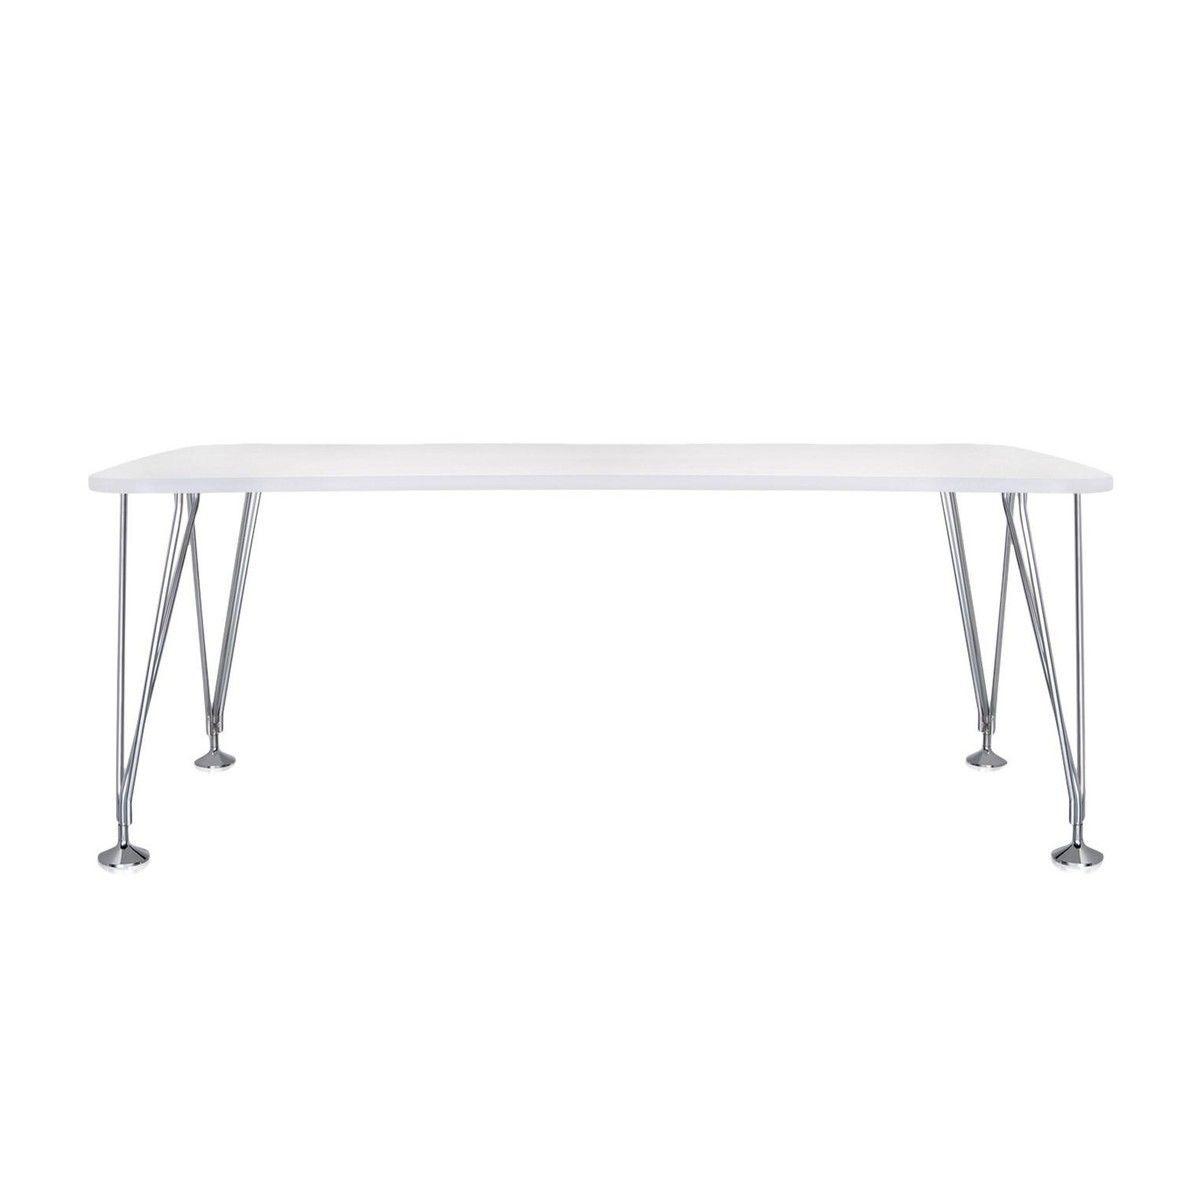 max table xcm  kartell  ambientedirectcom - kartell  max table xcm